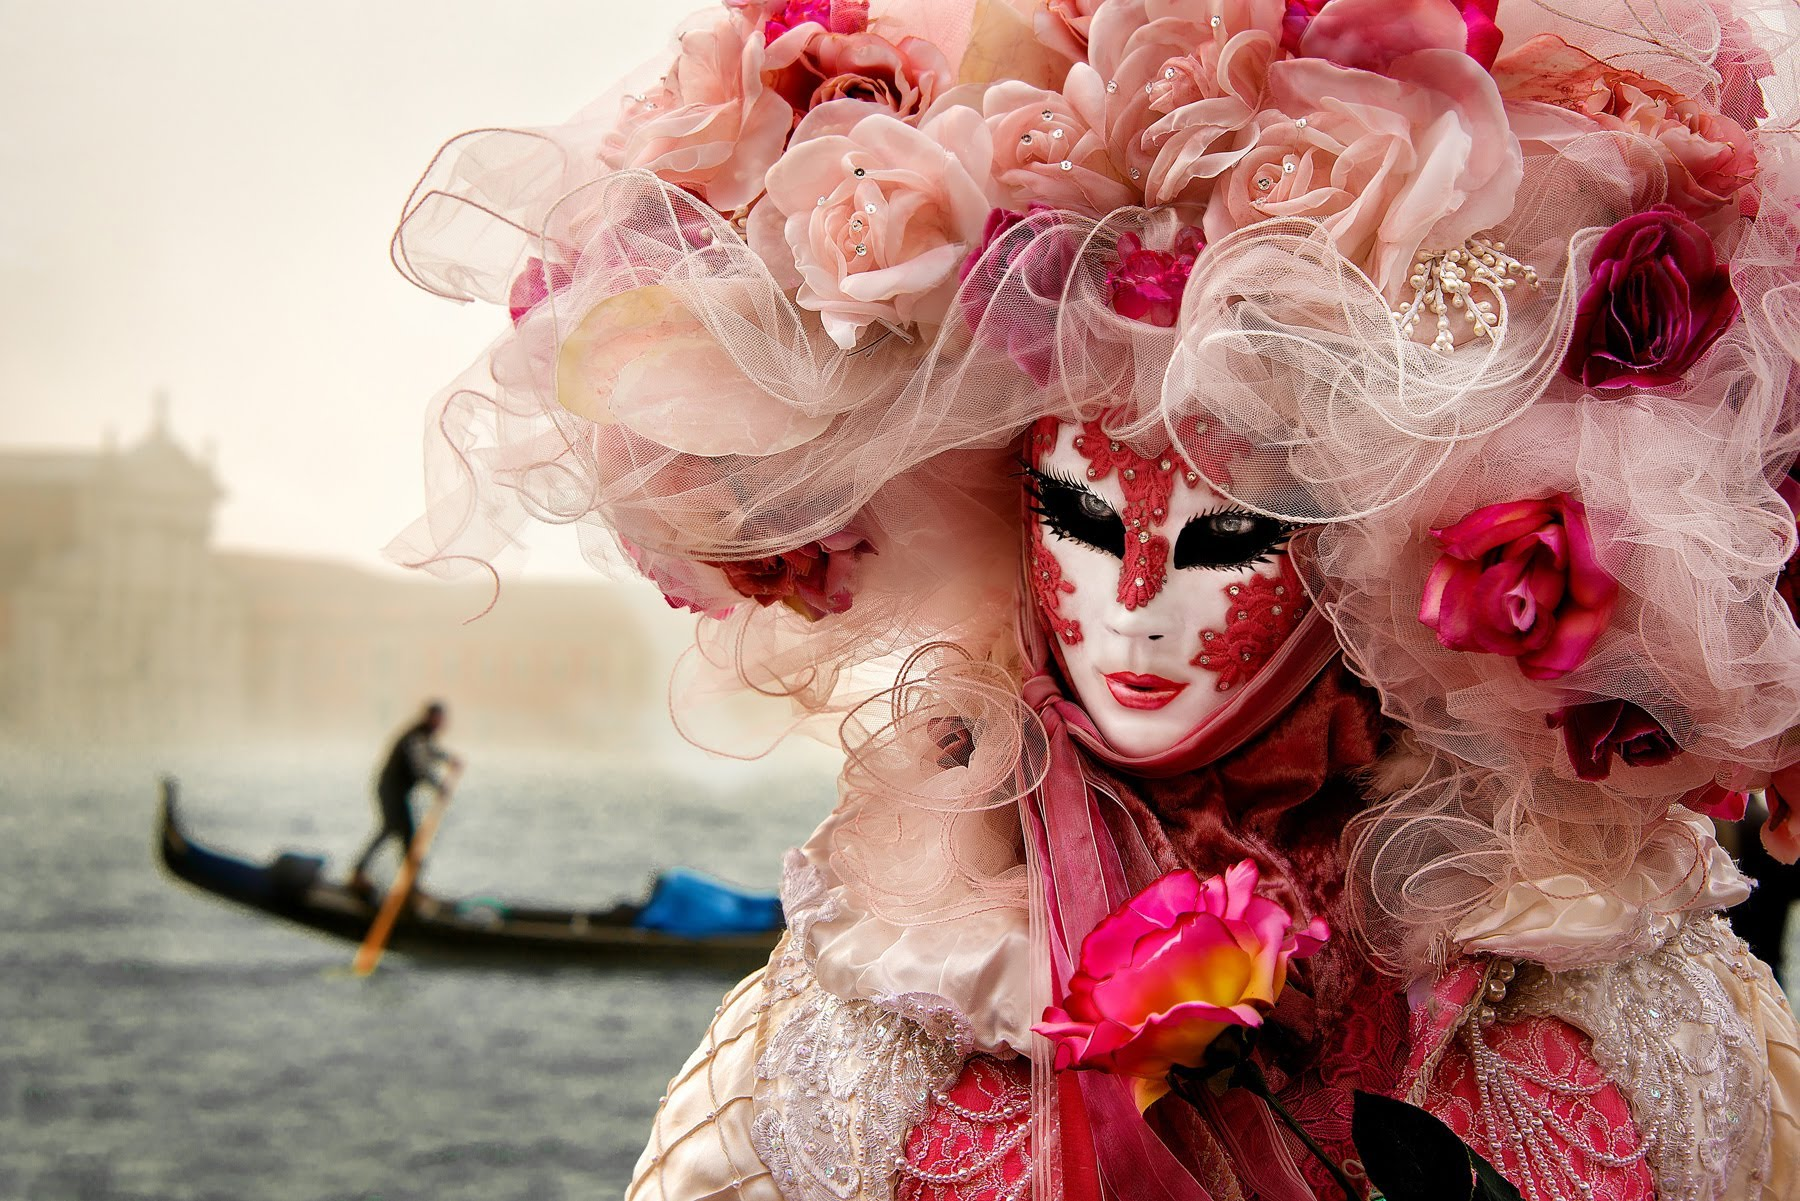 Carnevale di Venezia 2020 rendez vous fantasia houseboat